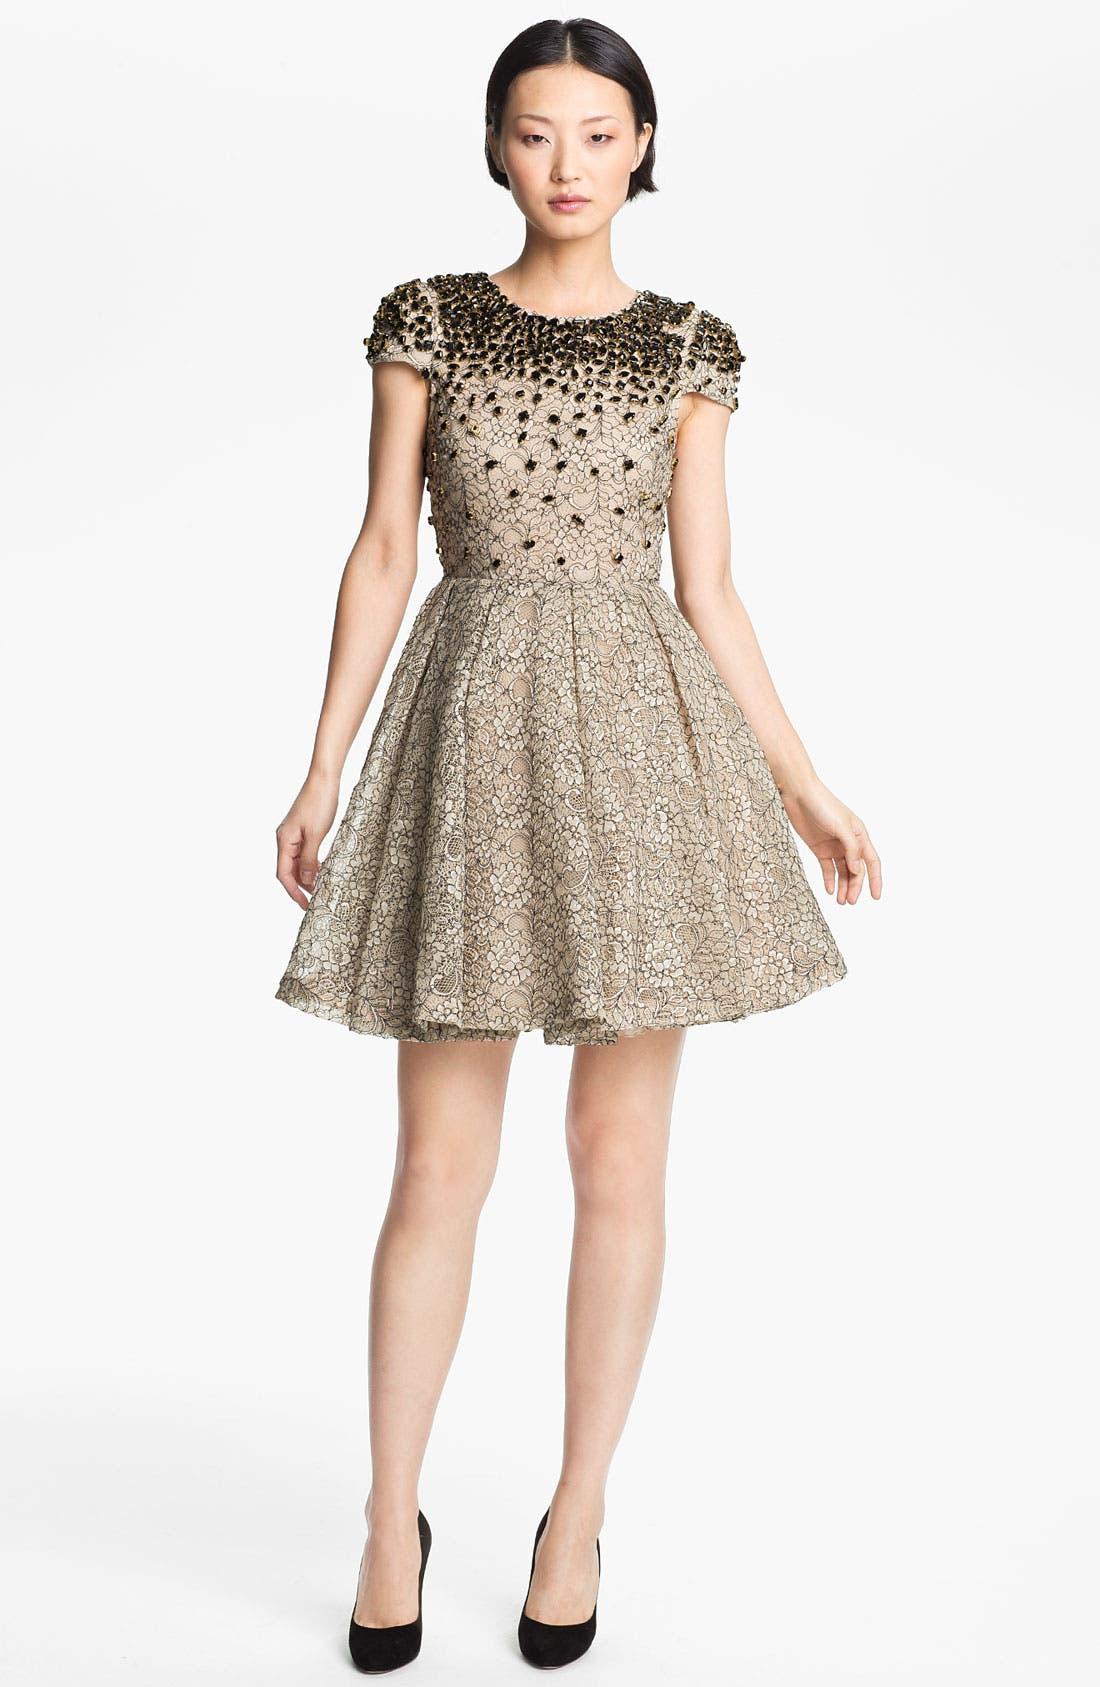 Alternate Image 1 Selected - Alice + Olivia 'Aubree' Embellished Dress